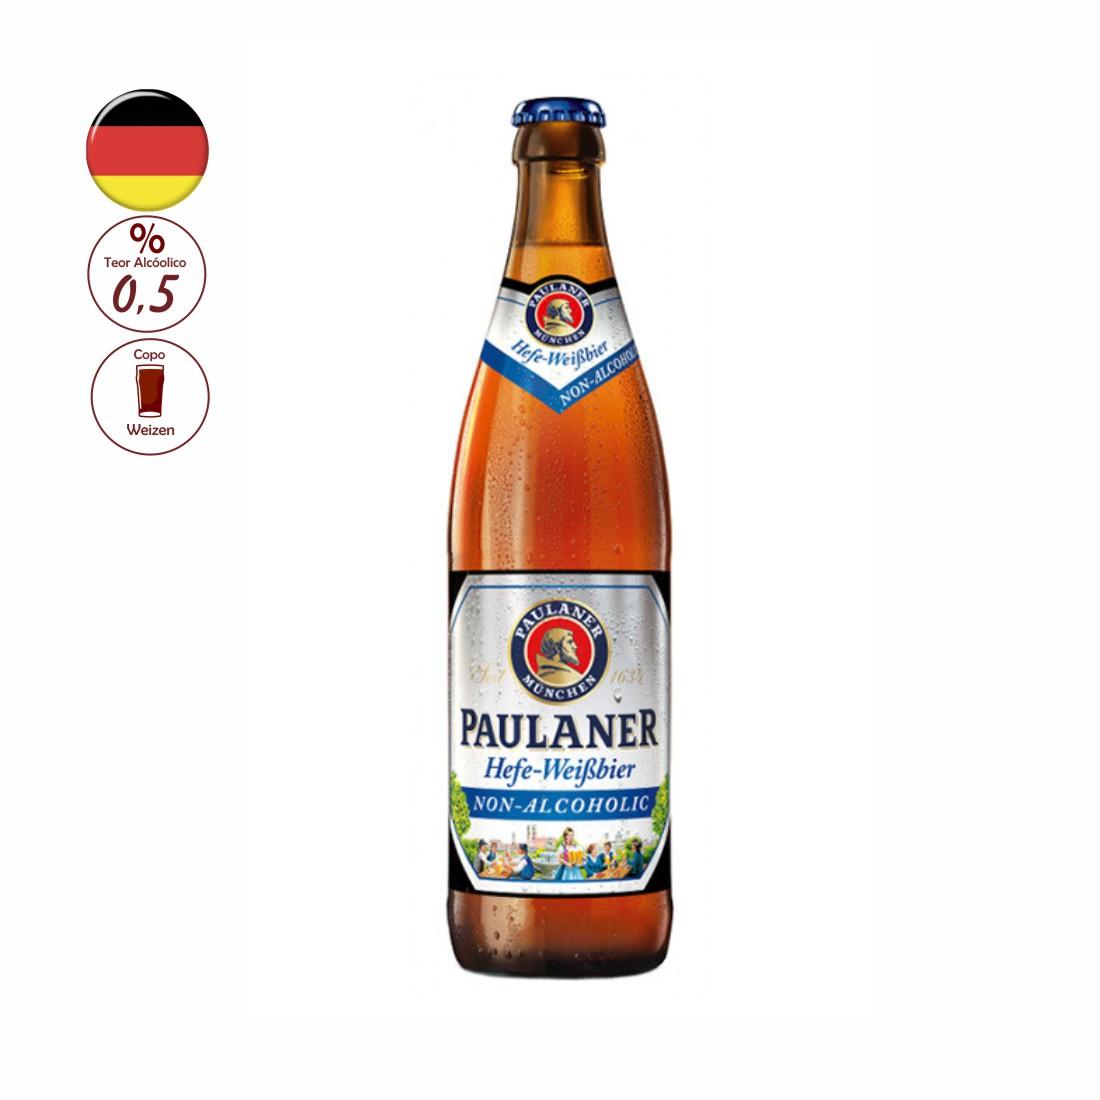 CERVEJA PAULANER 500ML HEFE-WEISSBIER ALKOHOLFREI S/ ALCOOL